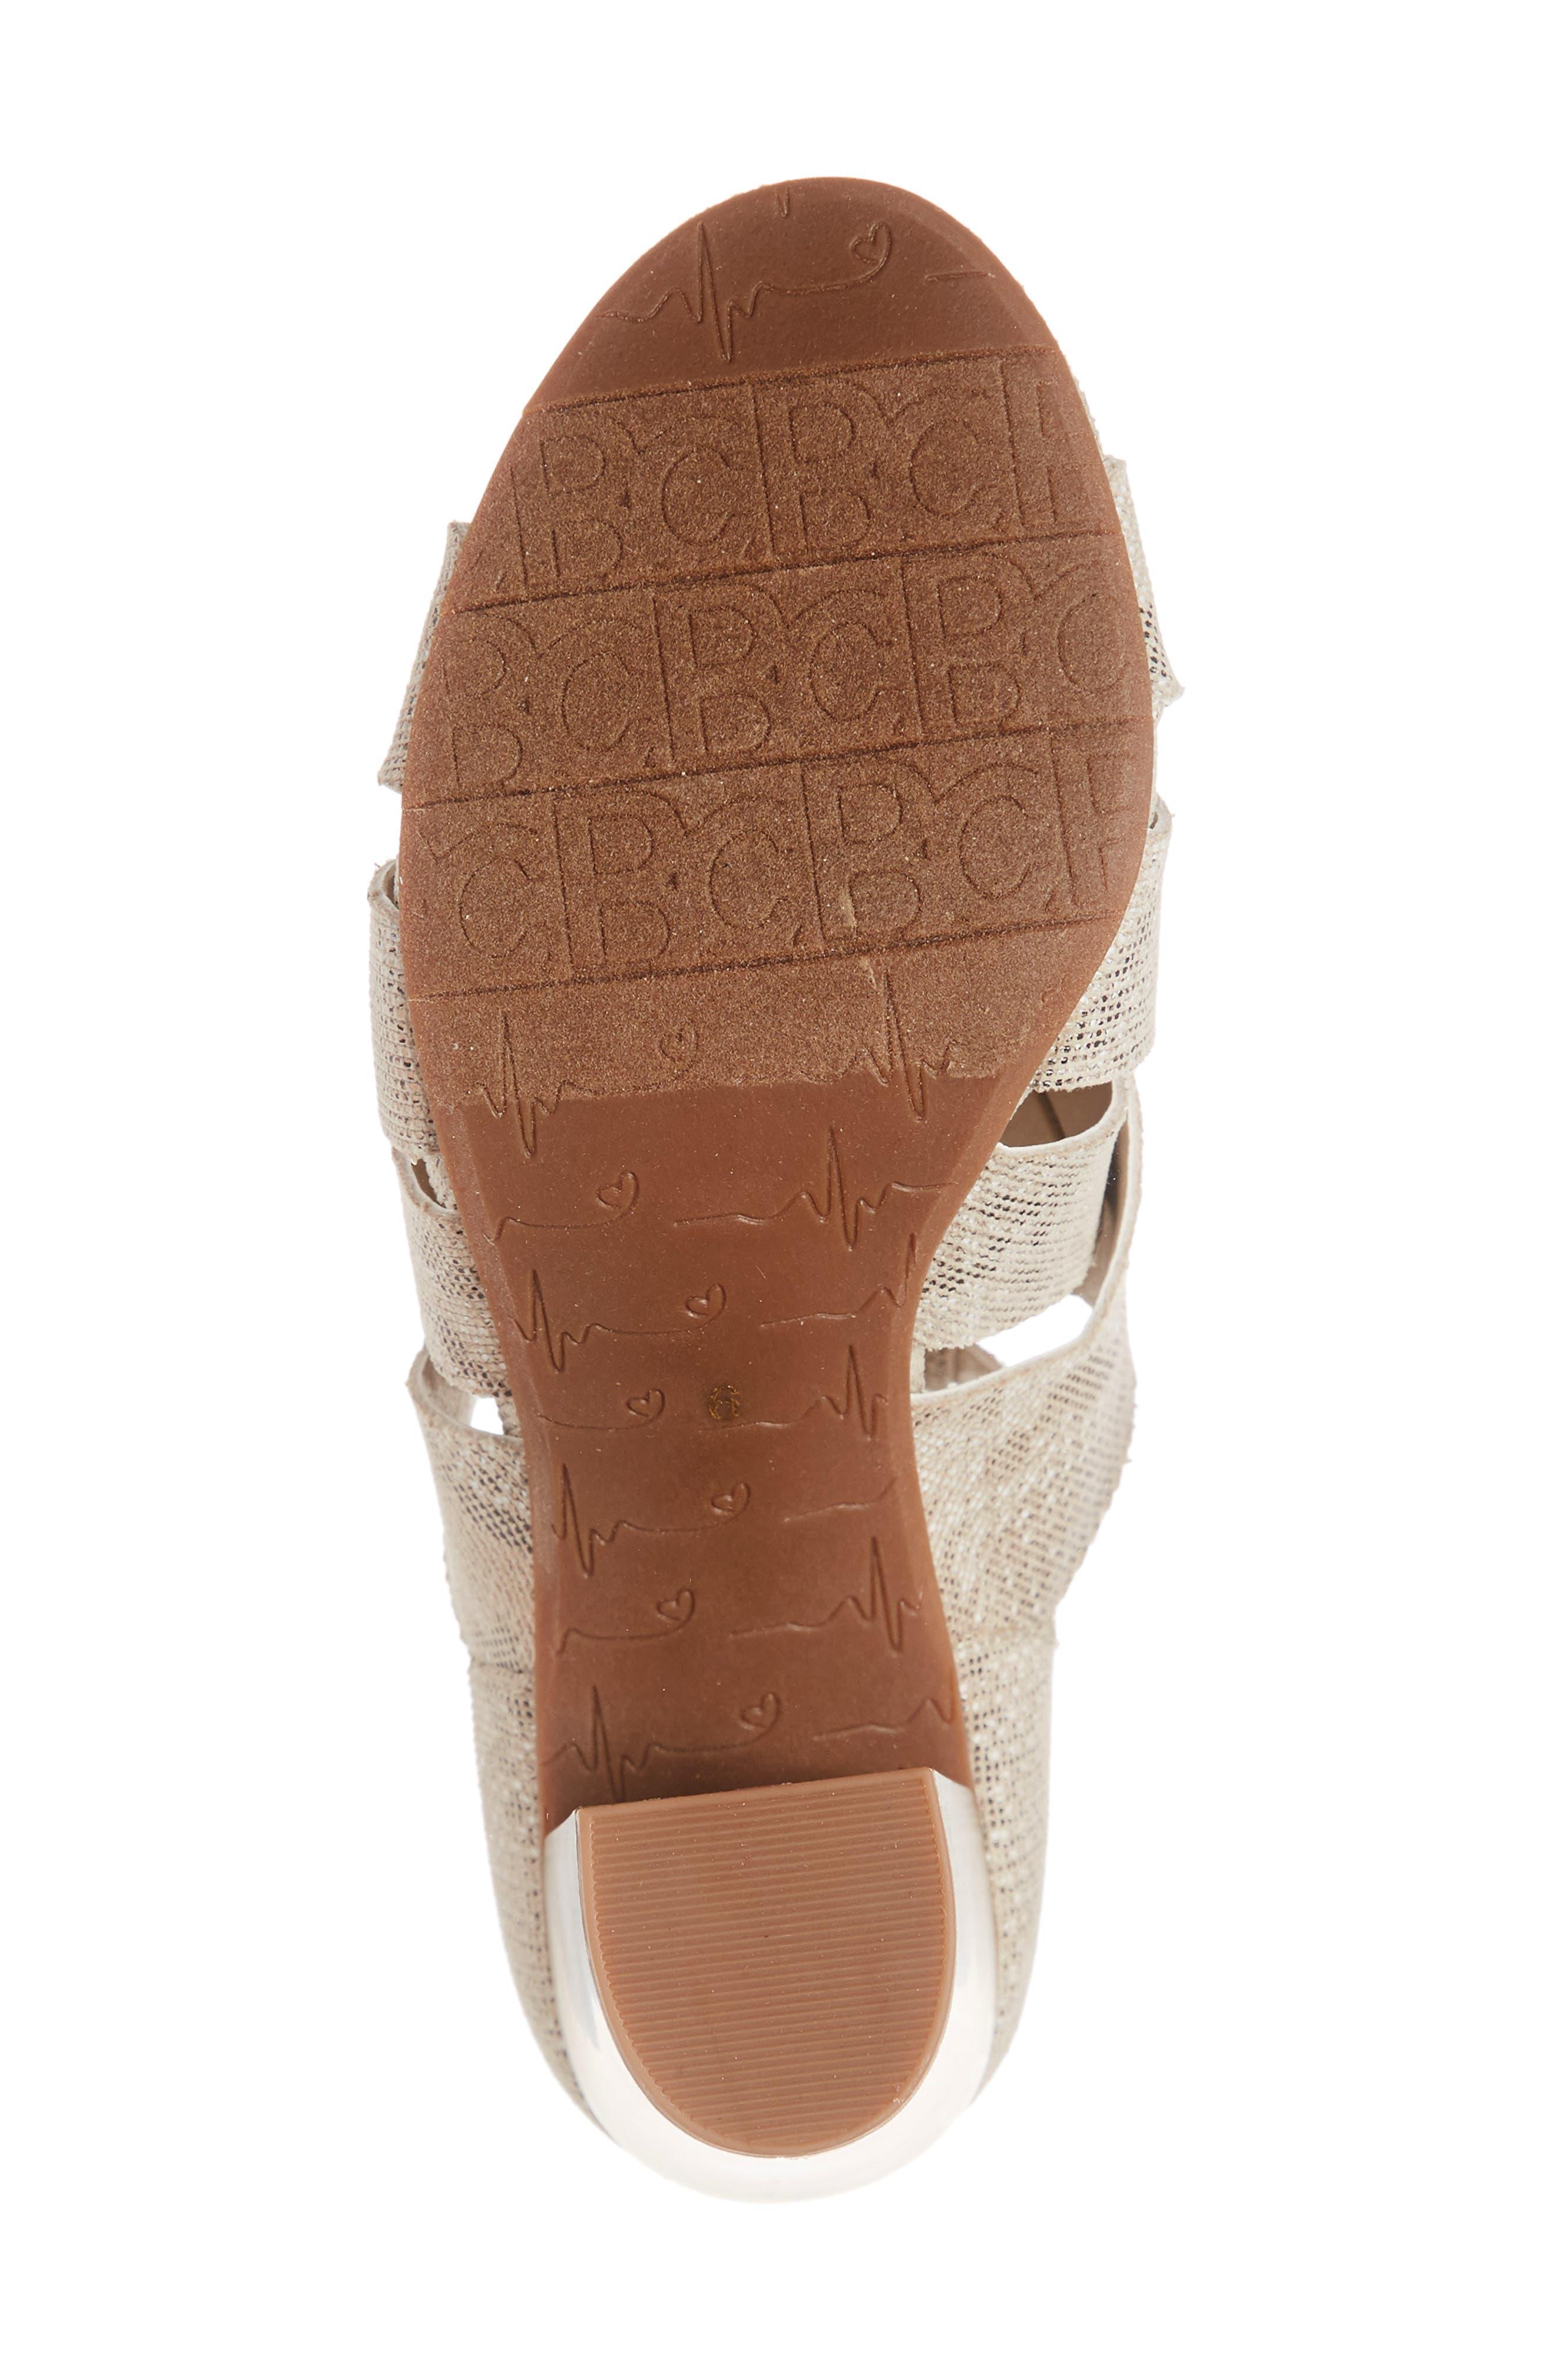 Pathway Block Heel Sandal,                             Alternate thumbnail 6, color,                             NATURAL